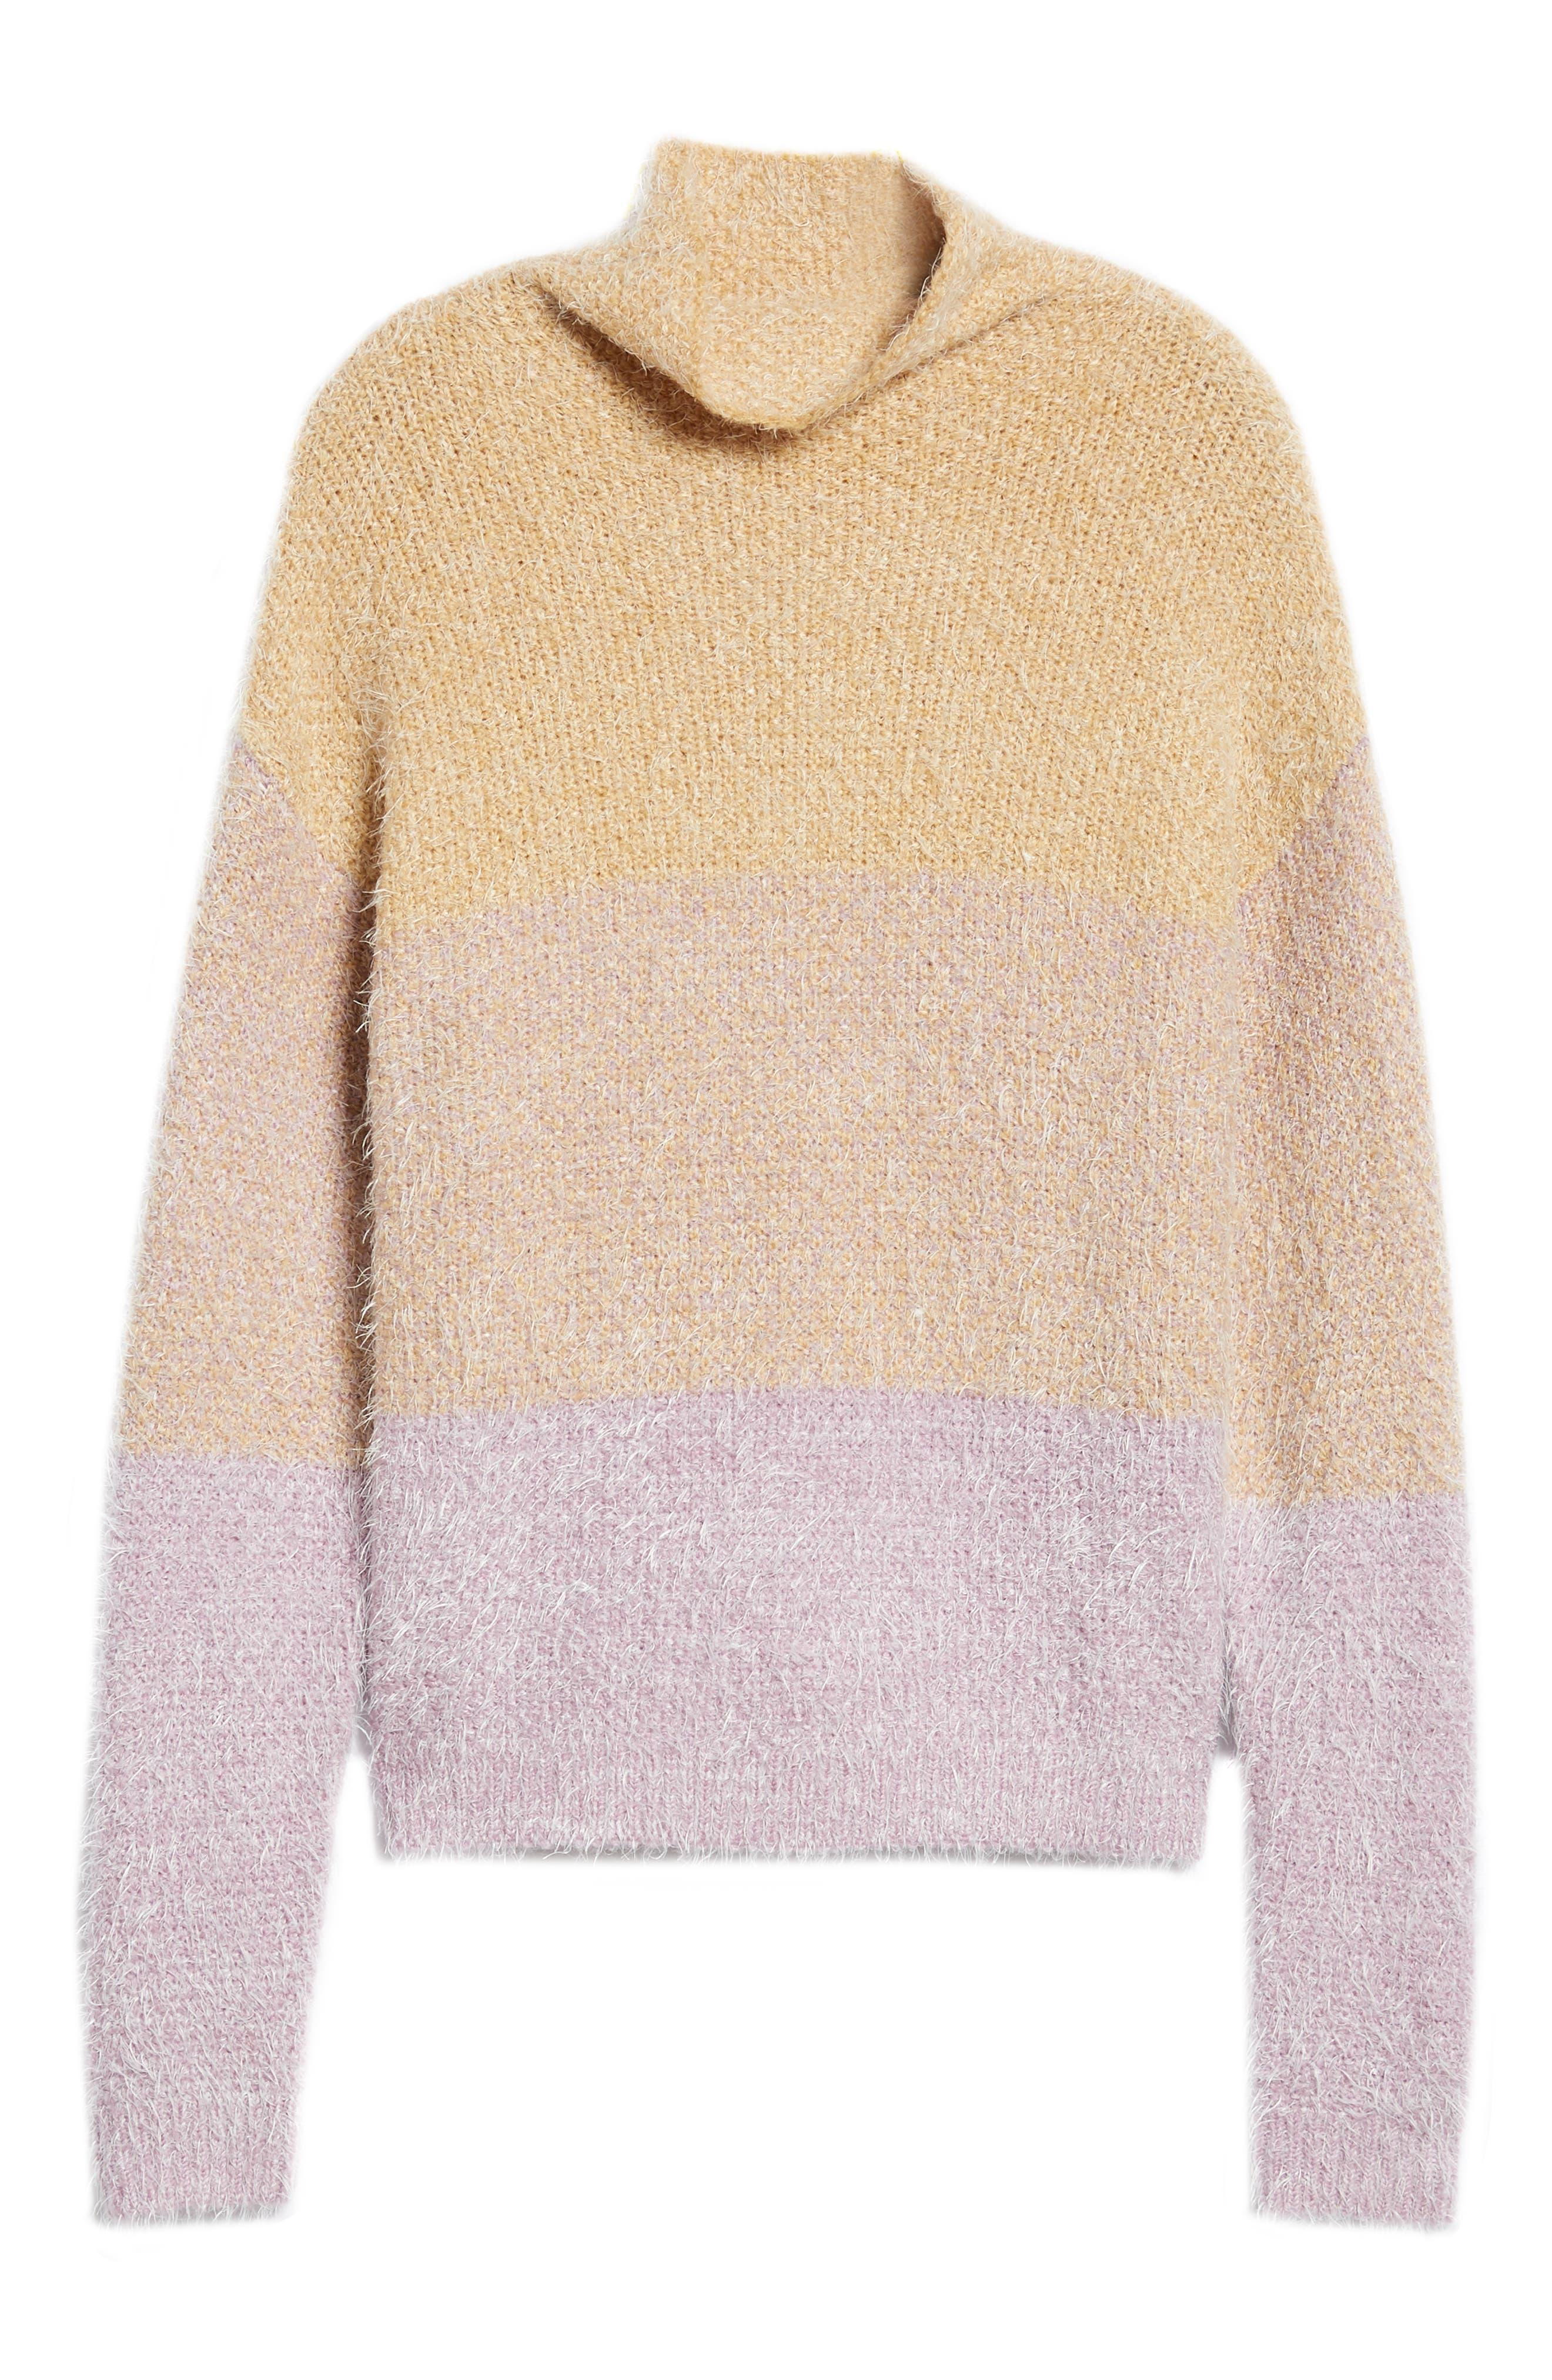 Ombré Eyelash Sweater,                             Alternate thumbnail 6, color,                             680